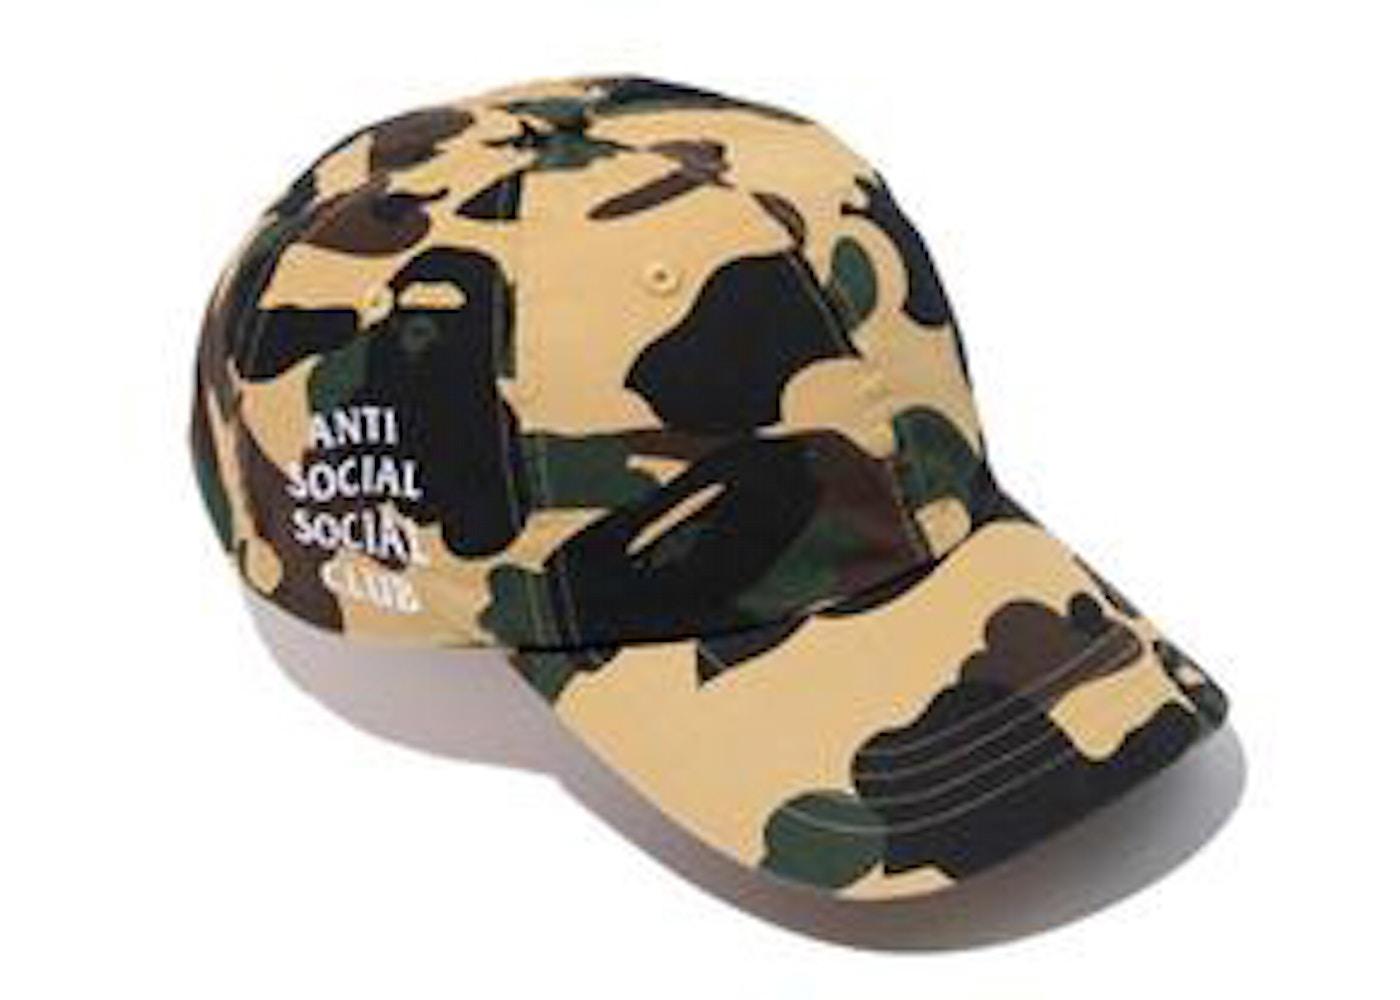 BAPE x Anti Social Social Club 1st Camo Strapback Hat Yellow Camo - SS17 3a084b8225f